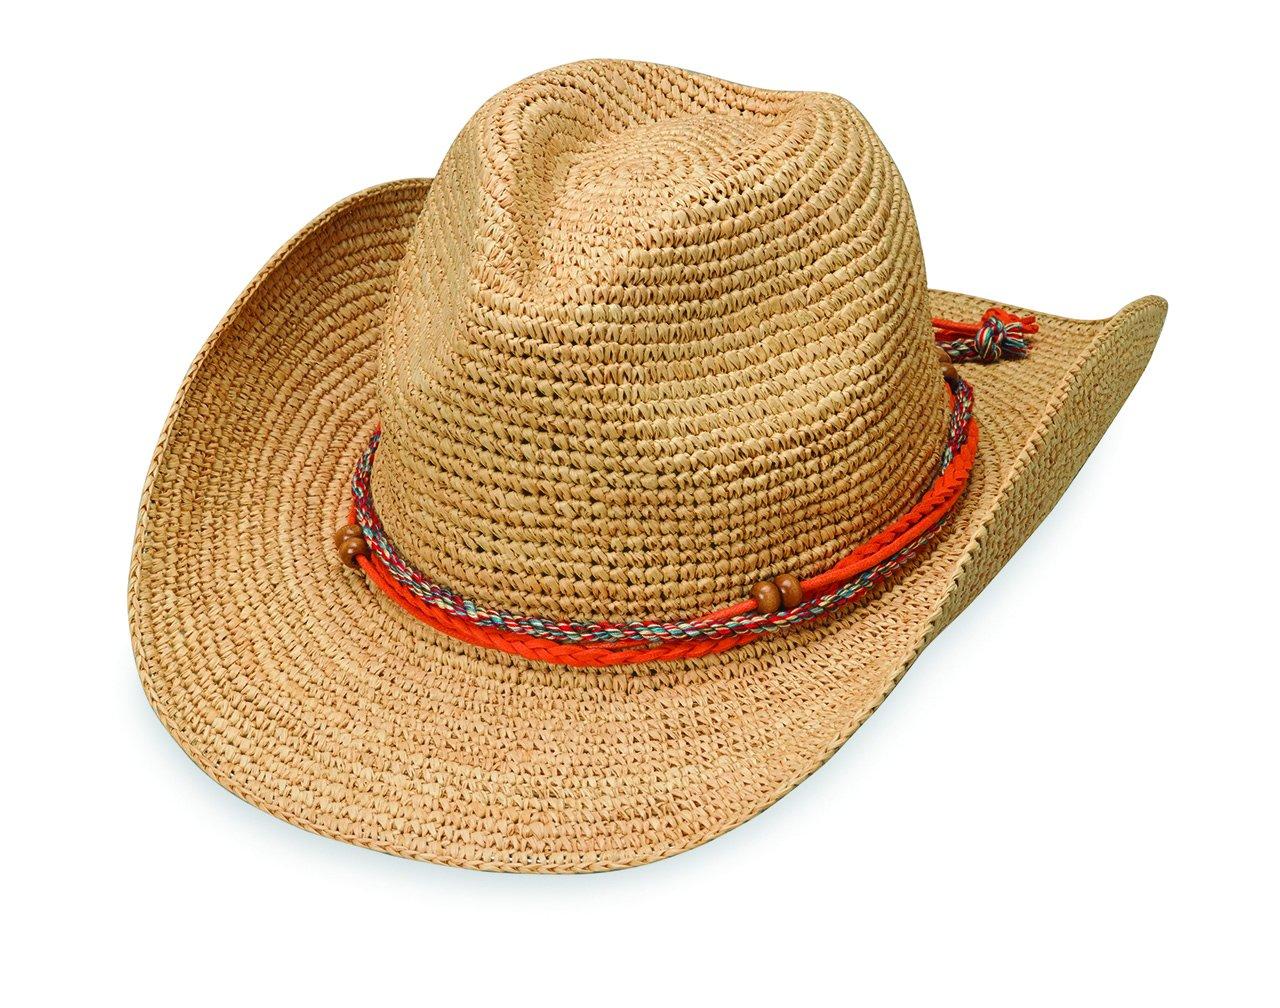 Wallaroo Hat Company Women's Catalina Cowboy Hat - Raffia, Modern Cowboy, Designed in Australia, Natural